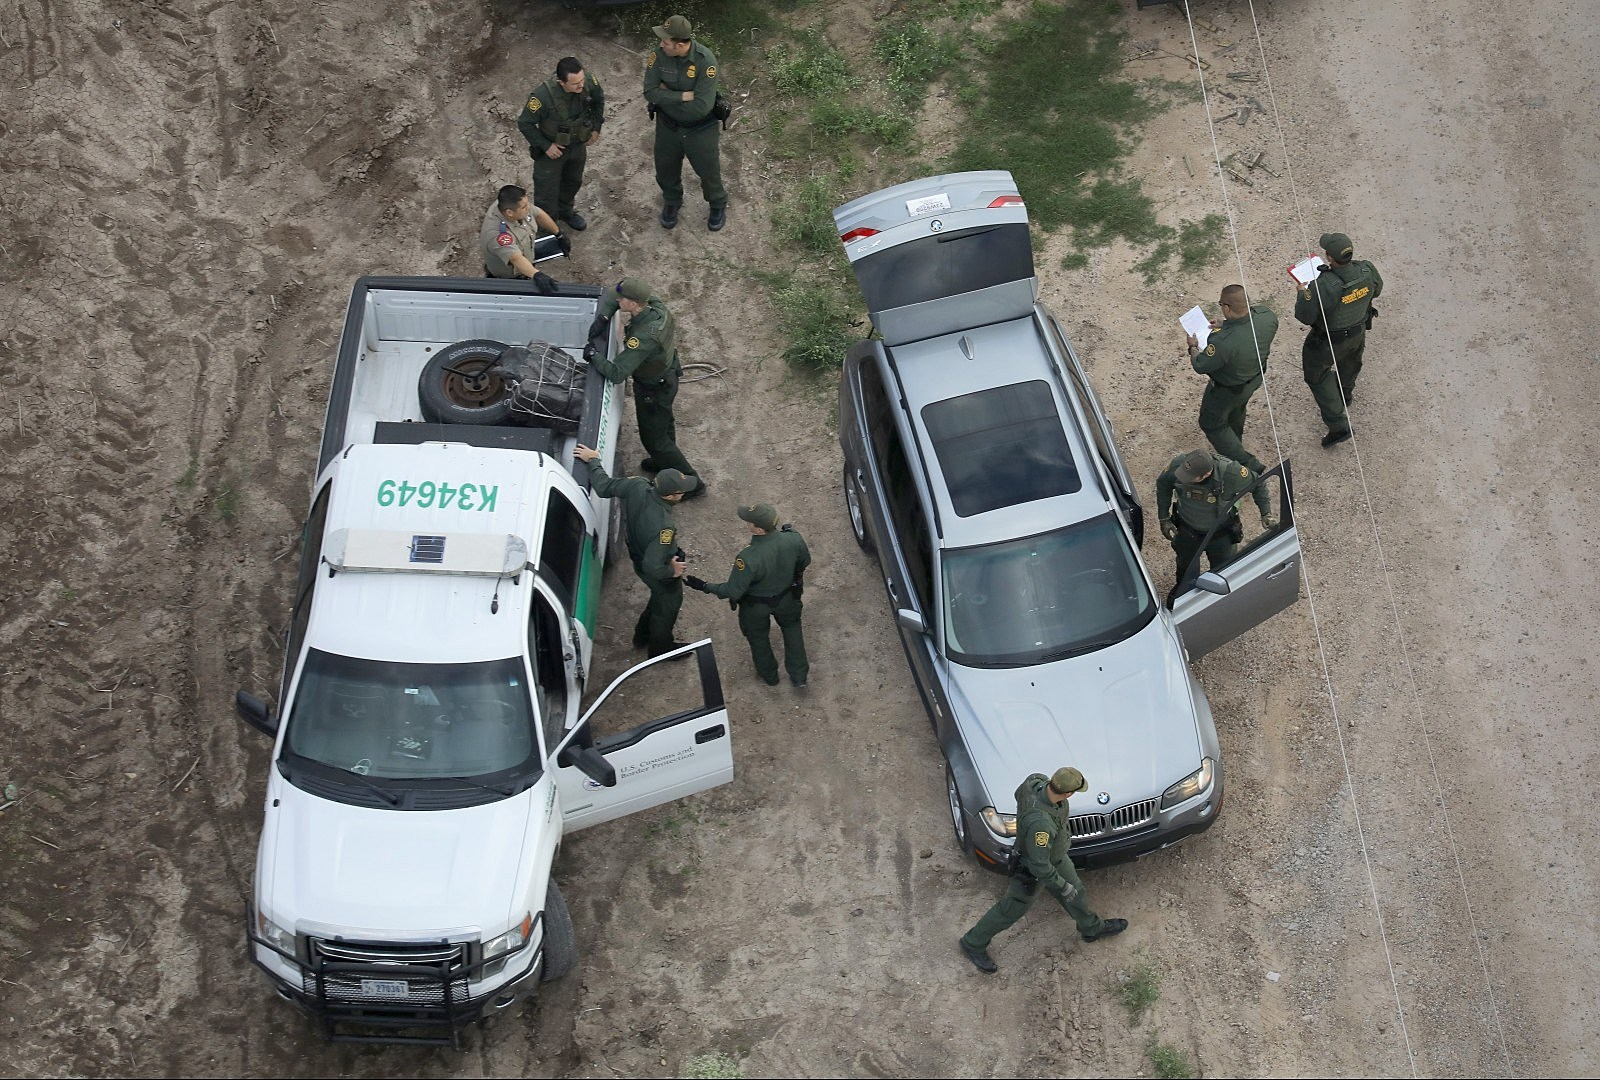 20 Arrested in Nampa This Week During Drug Raids